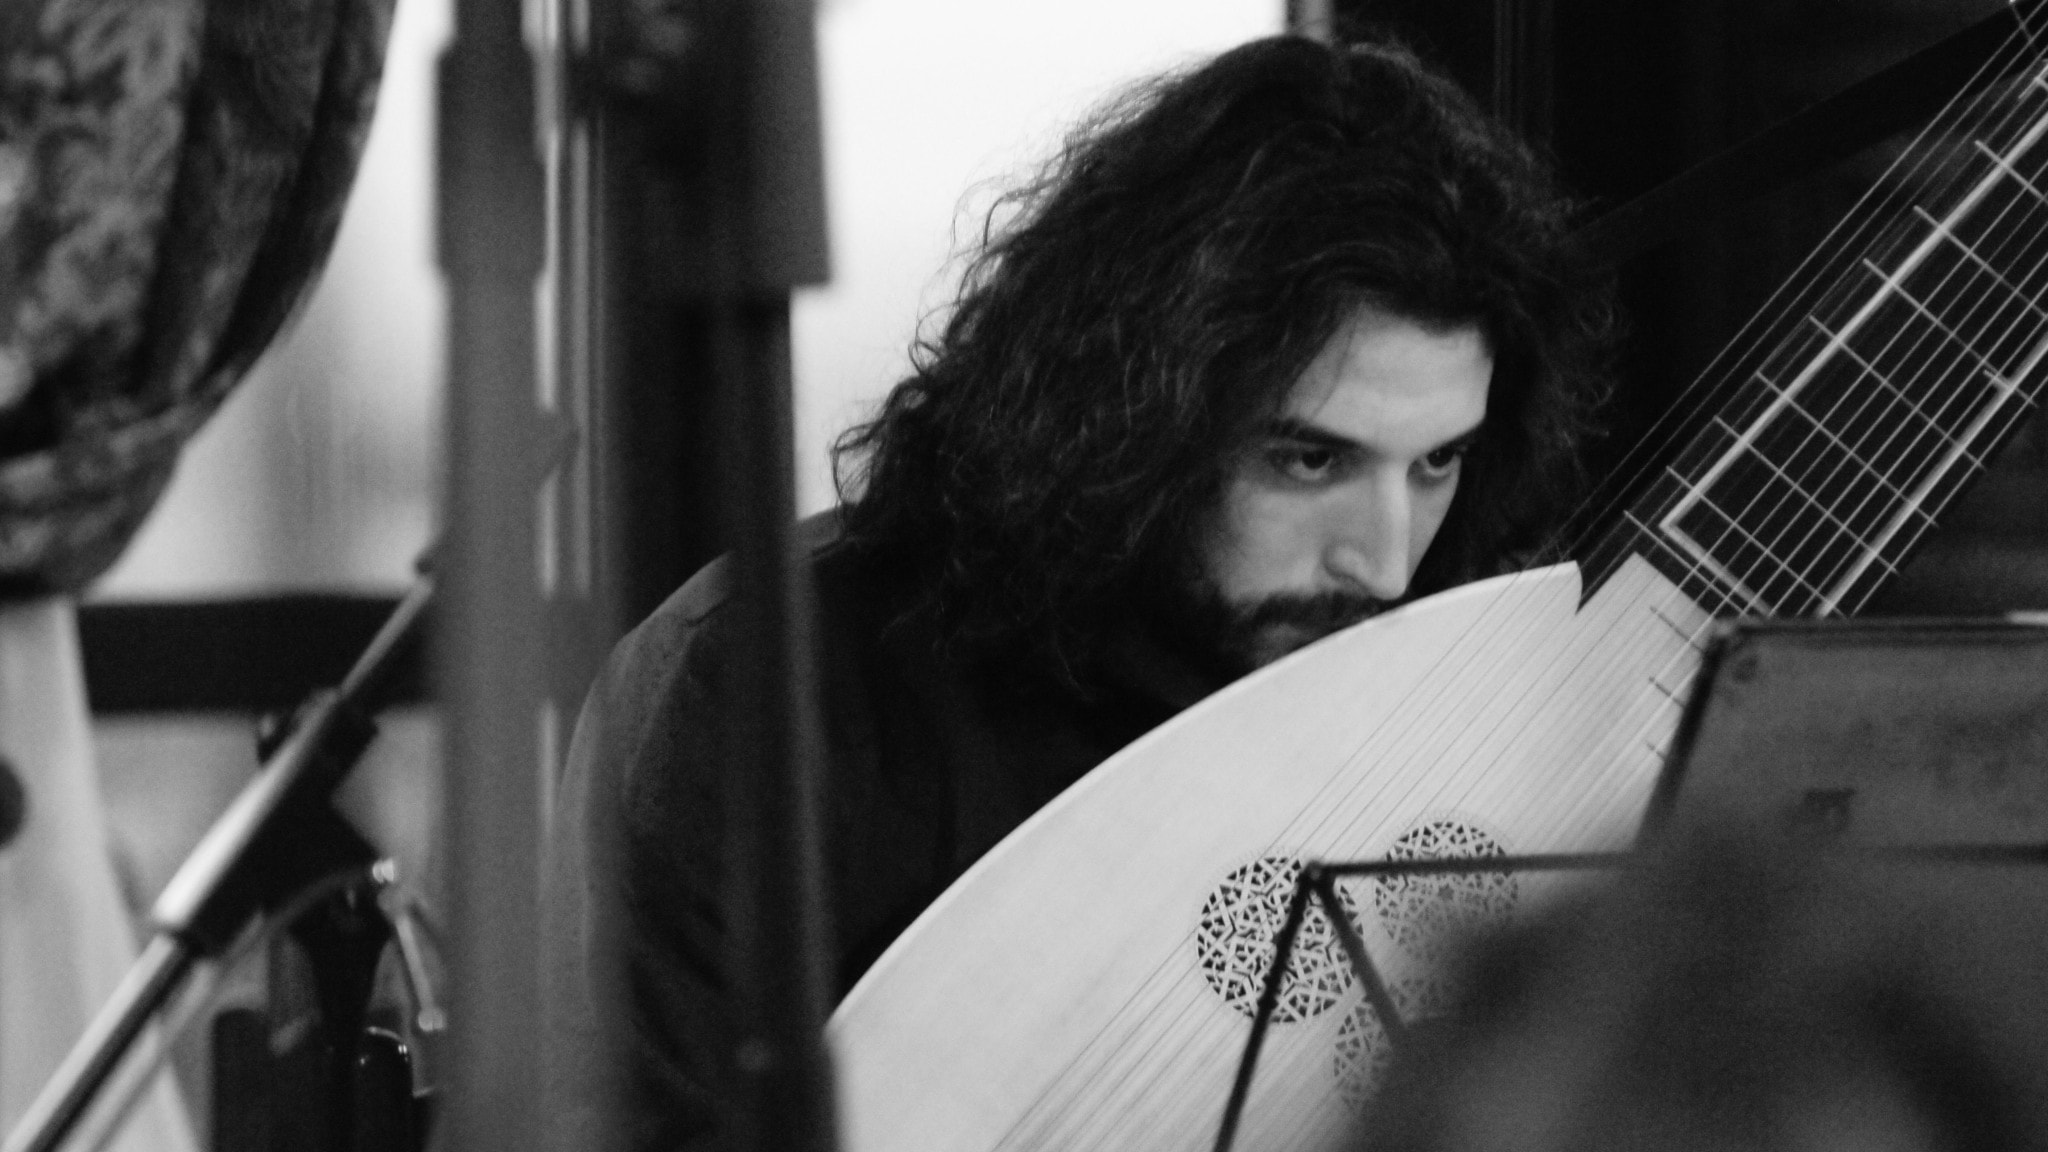 Theorbspelare Gianluca Geremia i Il pomo d'oro - svartvit bild